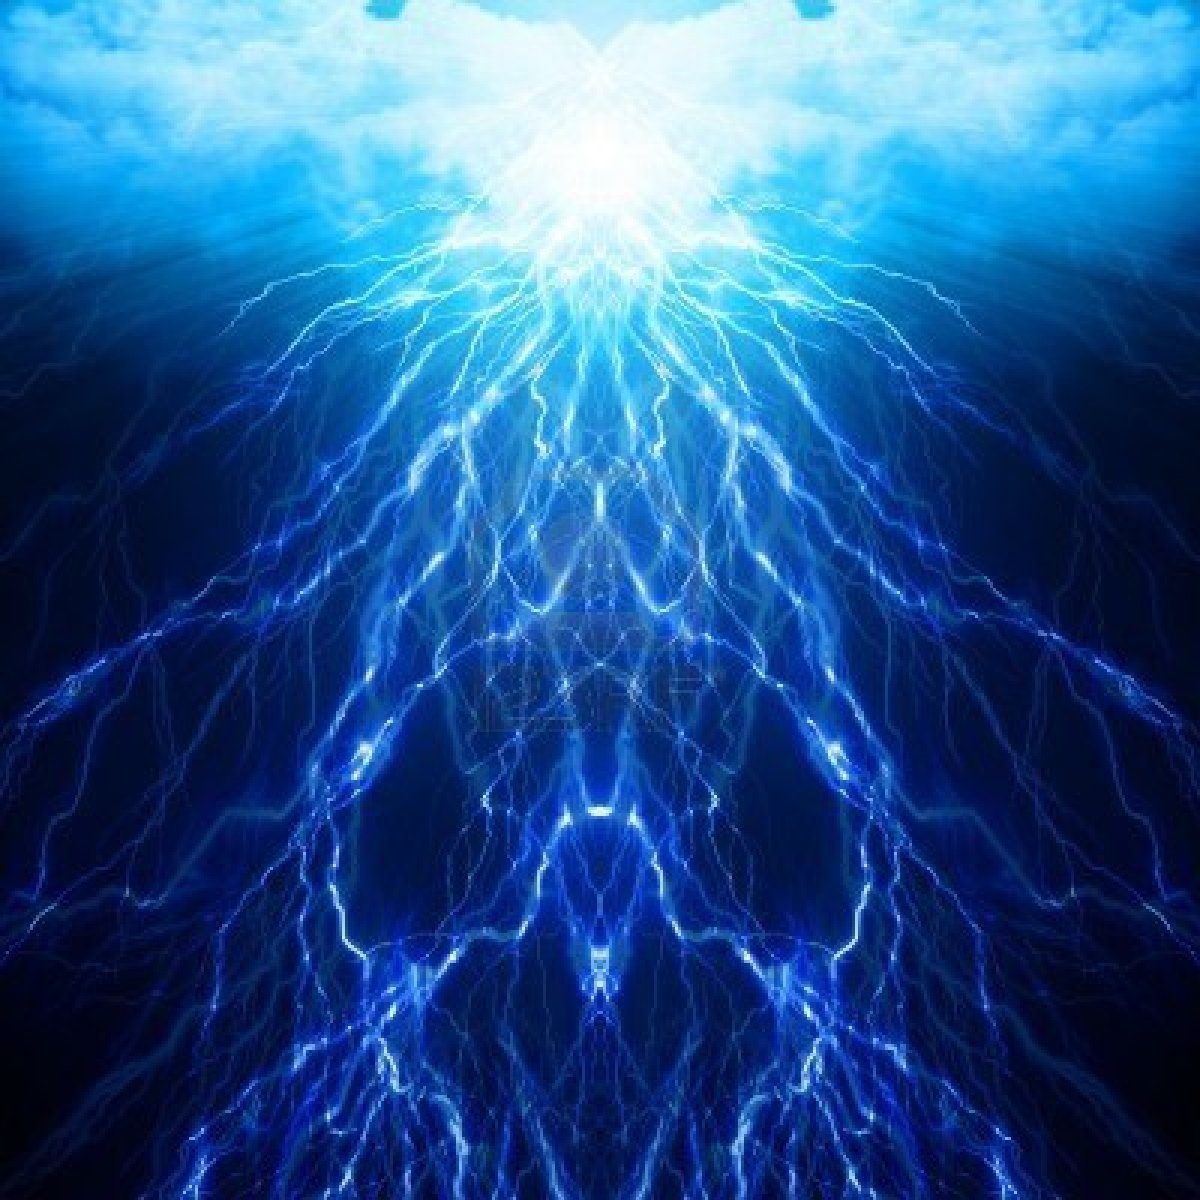 Blue Lightning Backgrounds wallpaper Blue Lightning Backgrounds hd 1200x1200